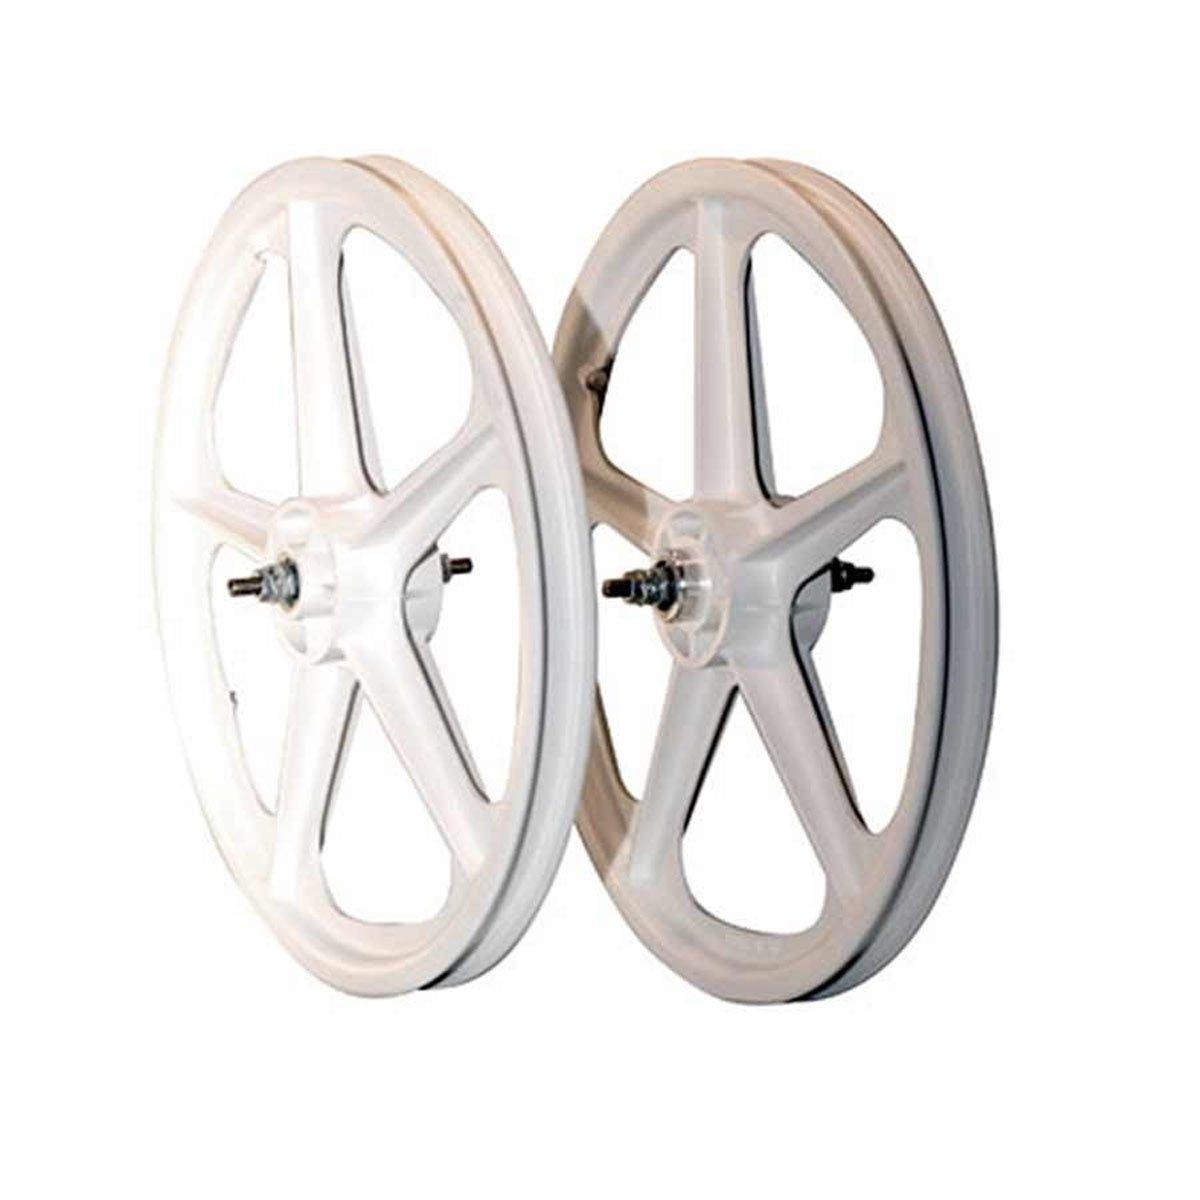 Skyway Tuff Ii 5 Spoke Mag 3/8 Nutted 20 X 1.75 Freewheel White Wheel Set